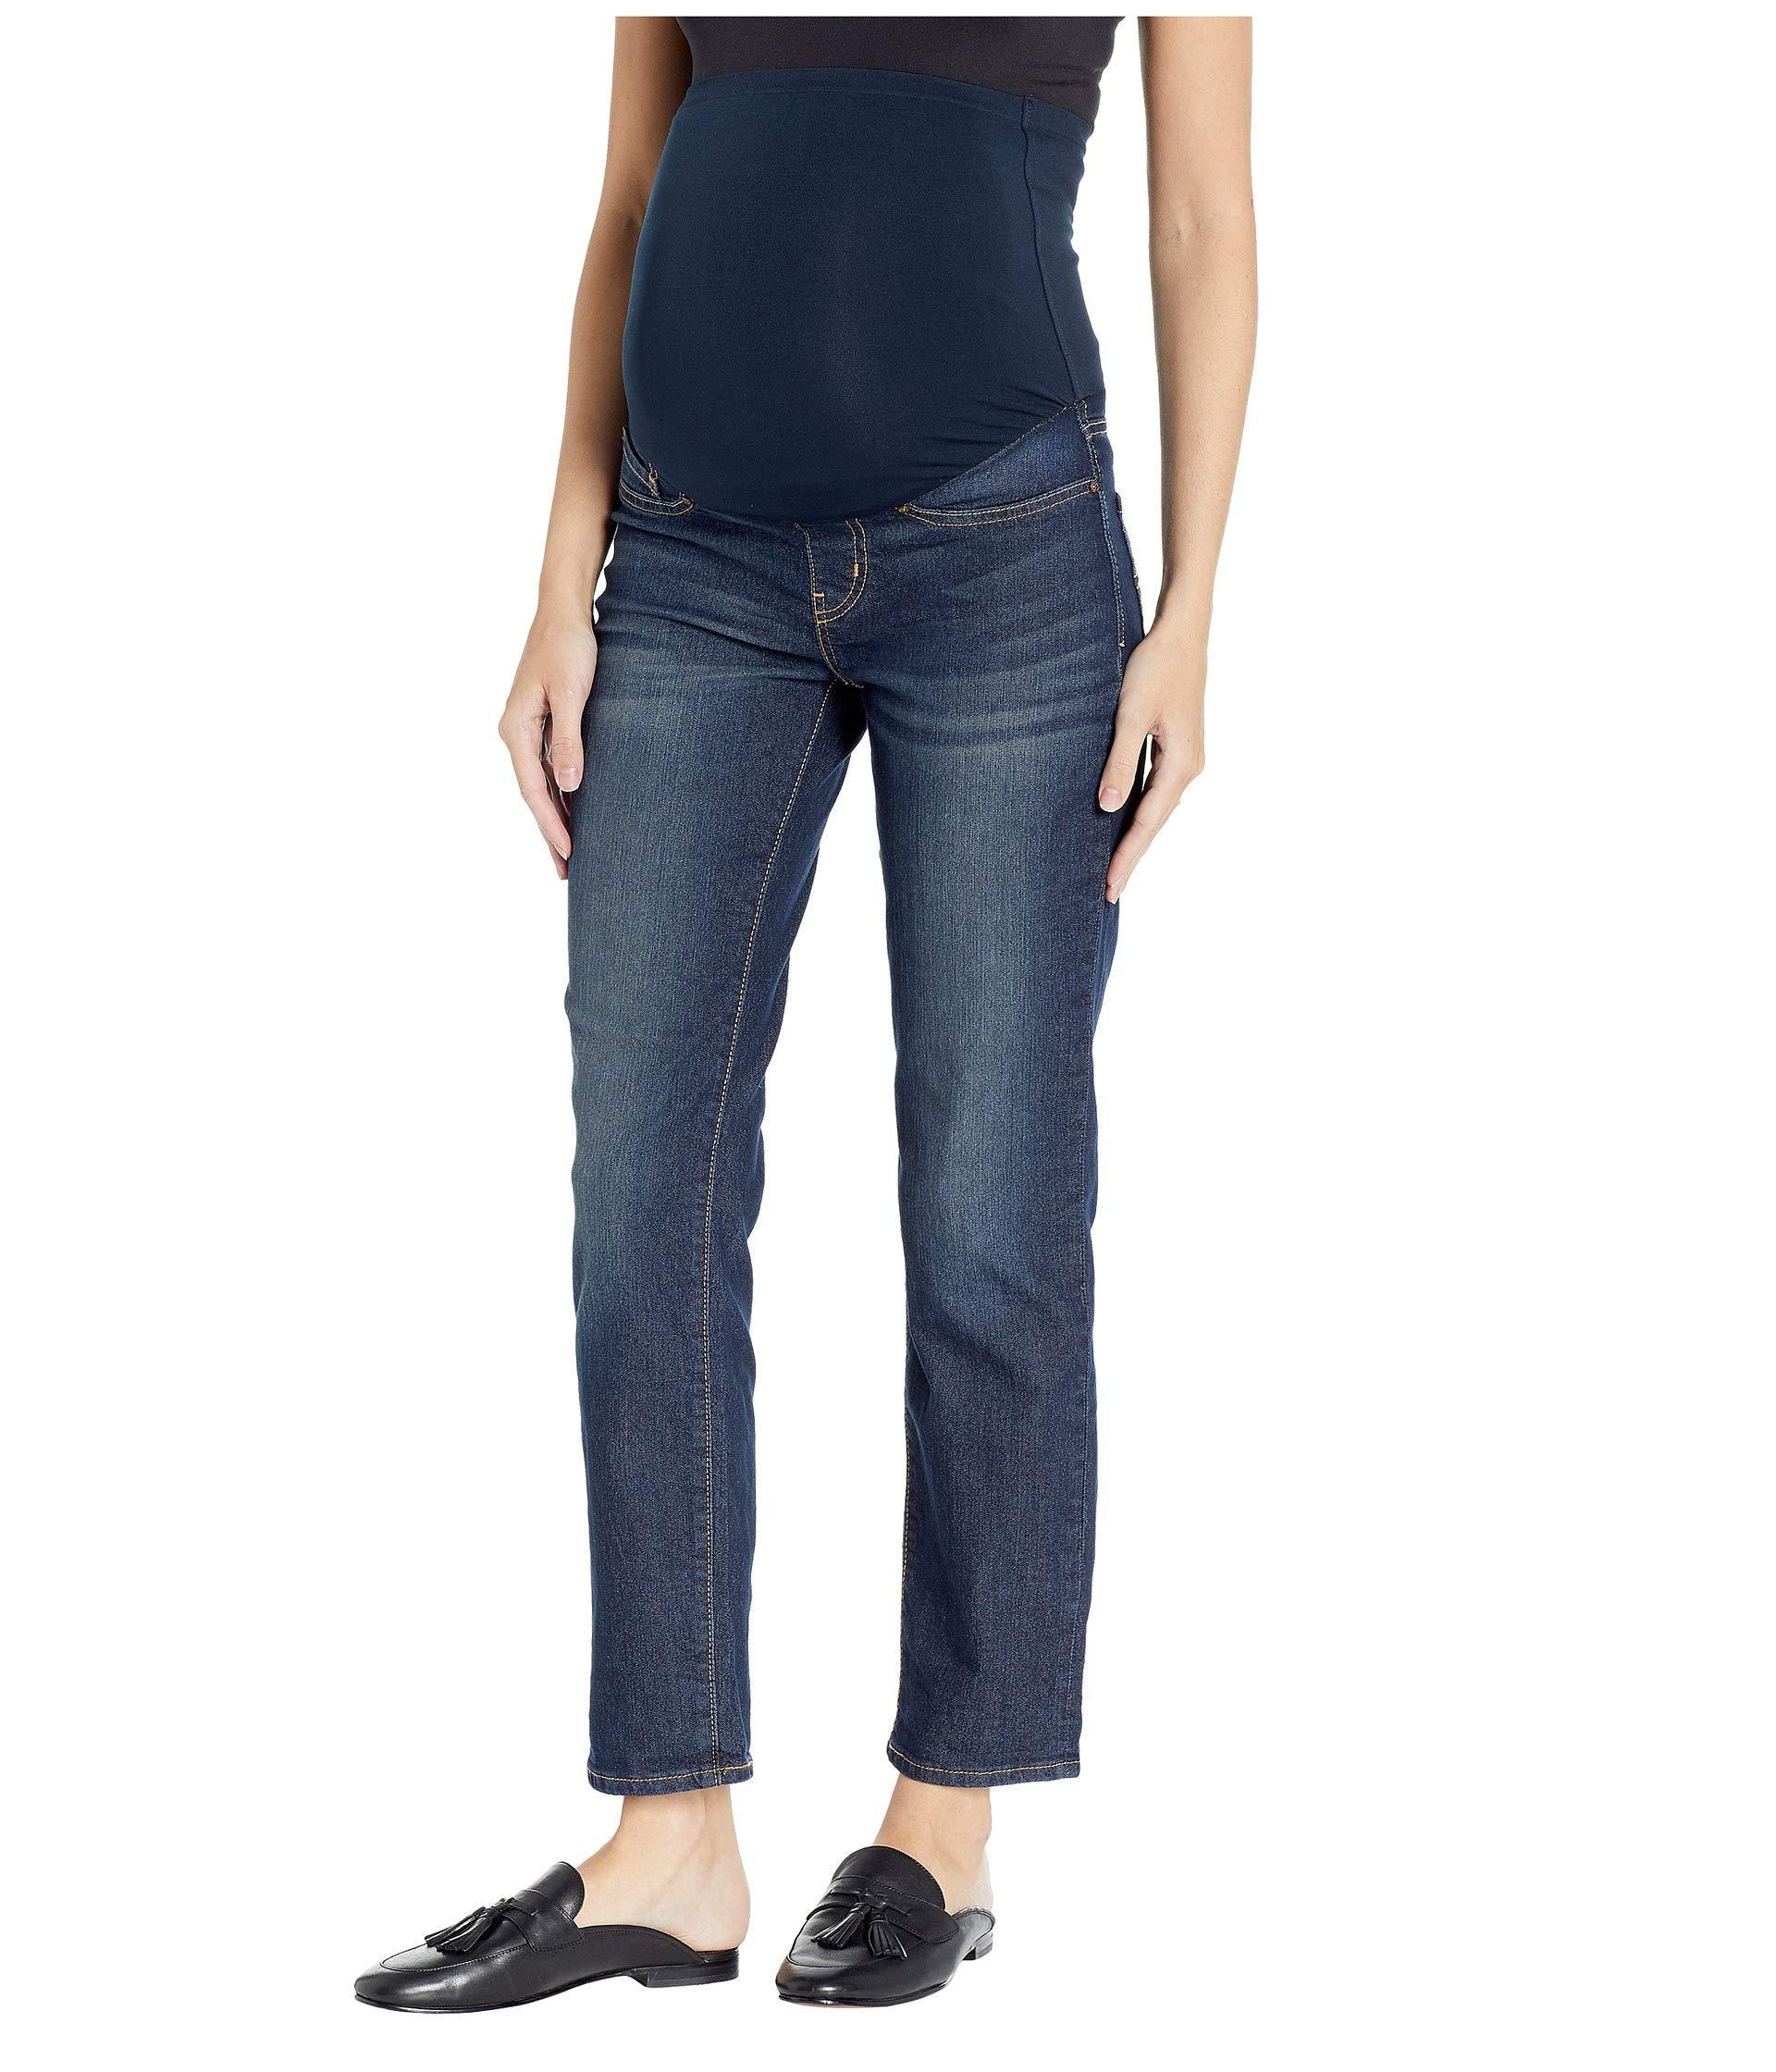 ef7d4fceab3bc Signature by Levi Strauss   Co. Gold Label. Women s Blue Maternity Slim  Boyfriend Jeans